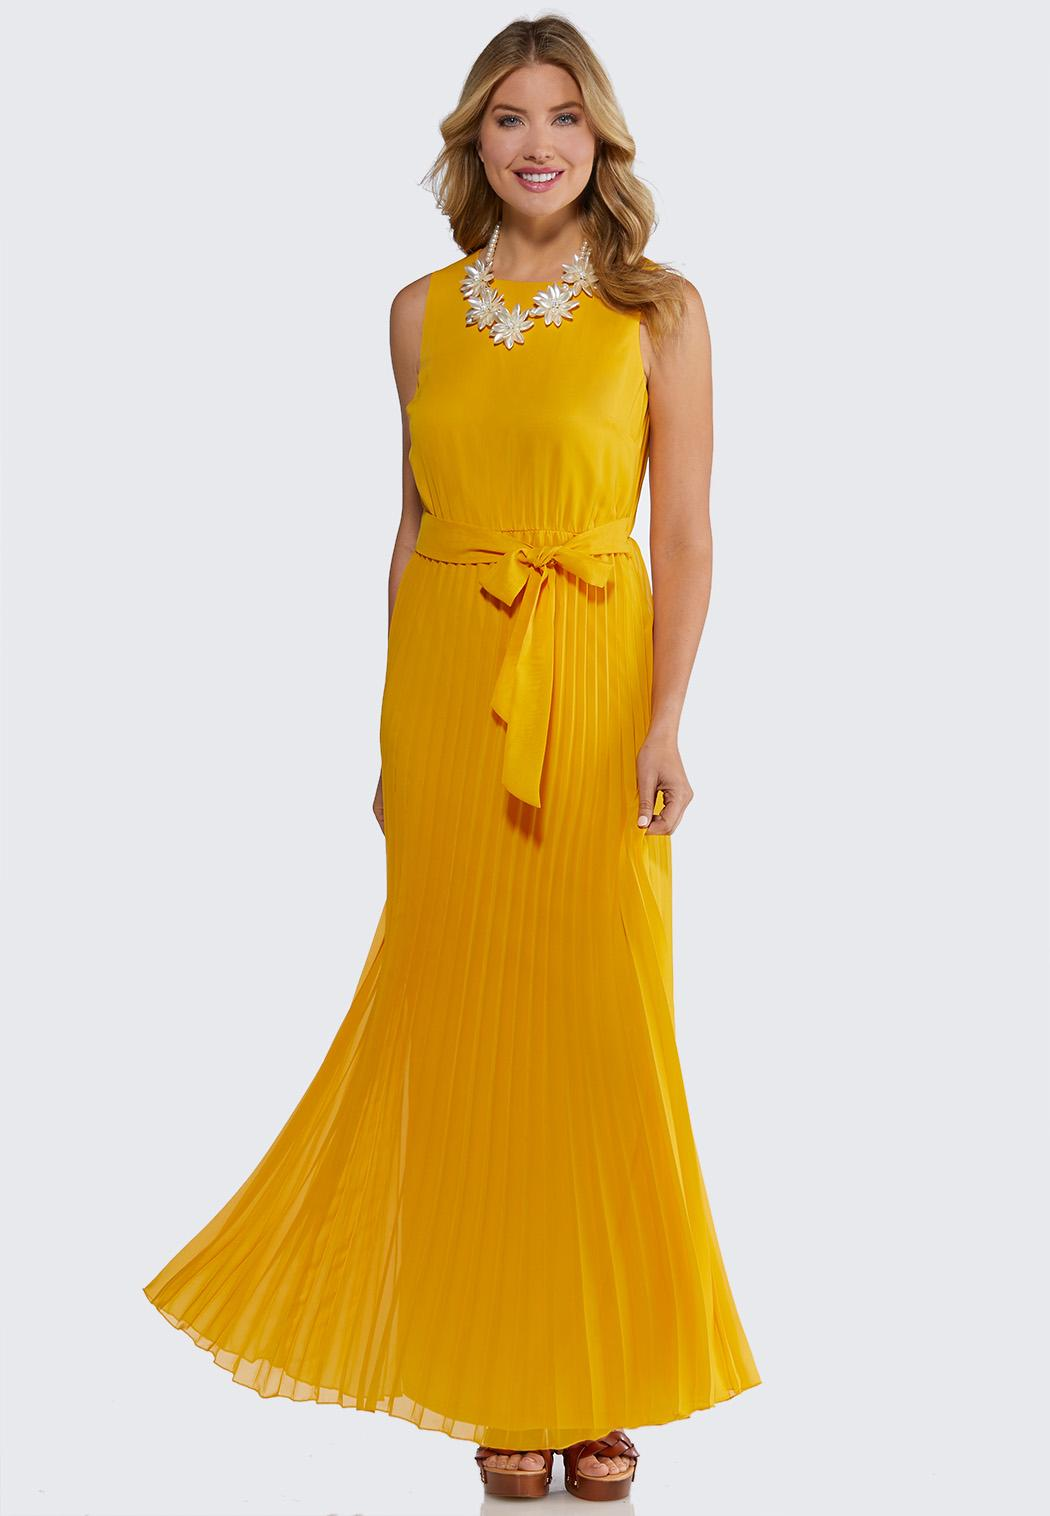 896b22dad15 Petite Summer Maxi Dresses - Data Dynamic AG